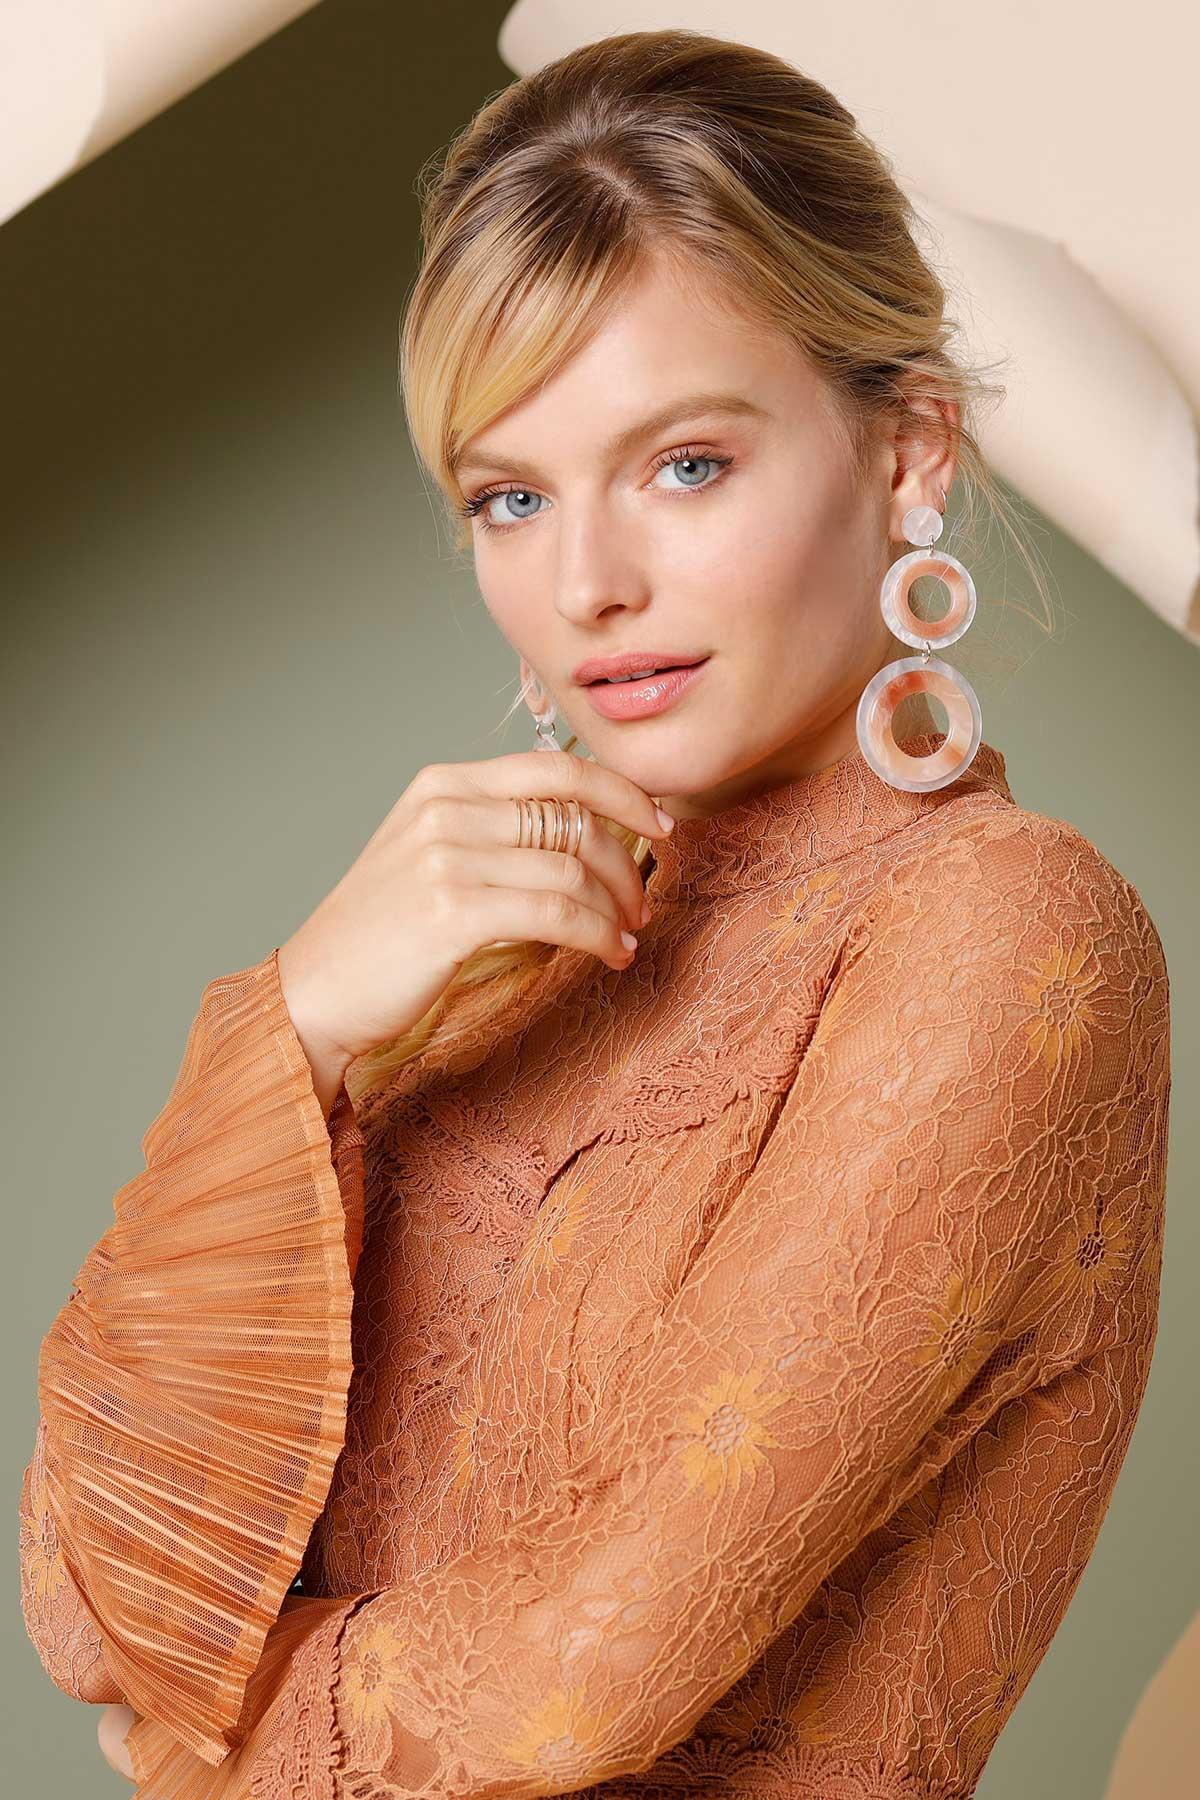 Circular Lucite Earrings